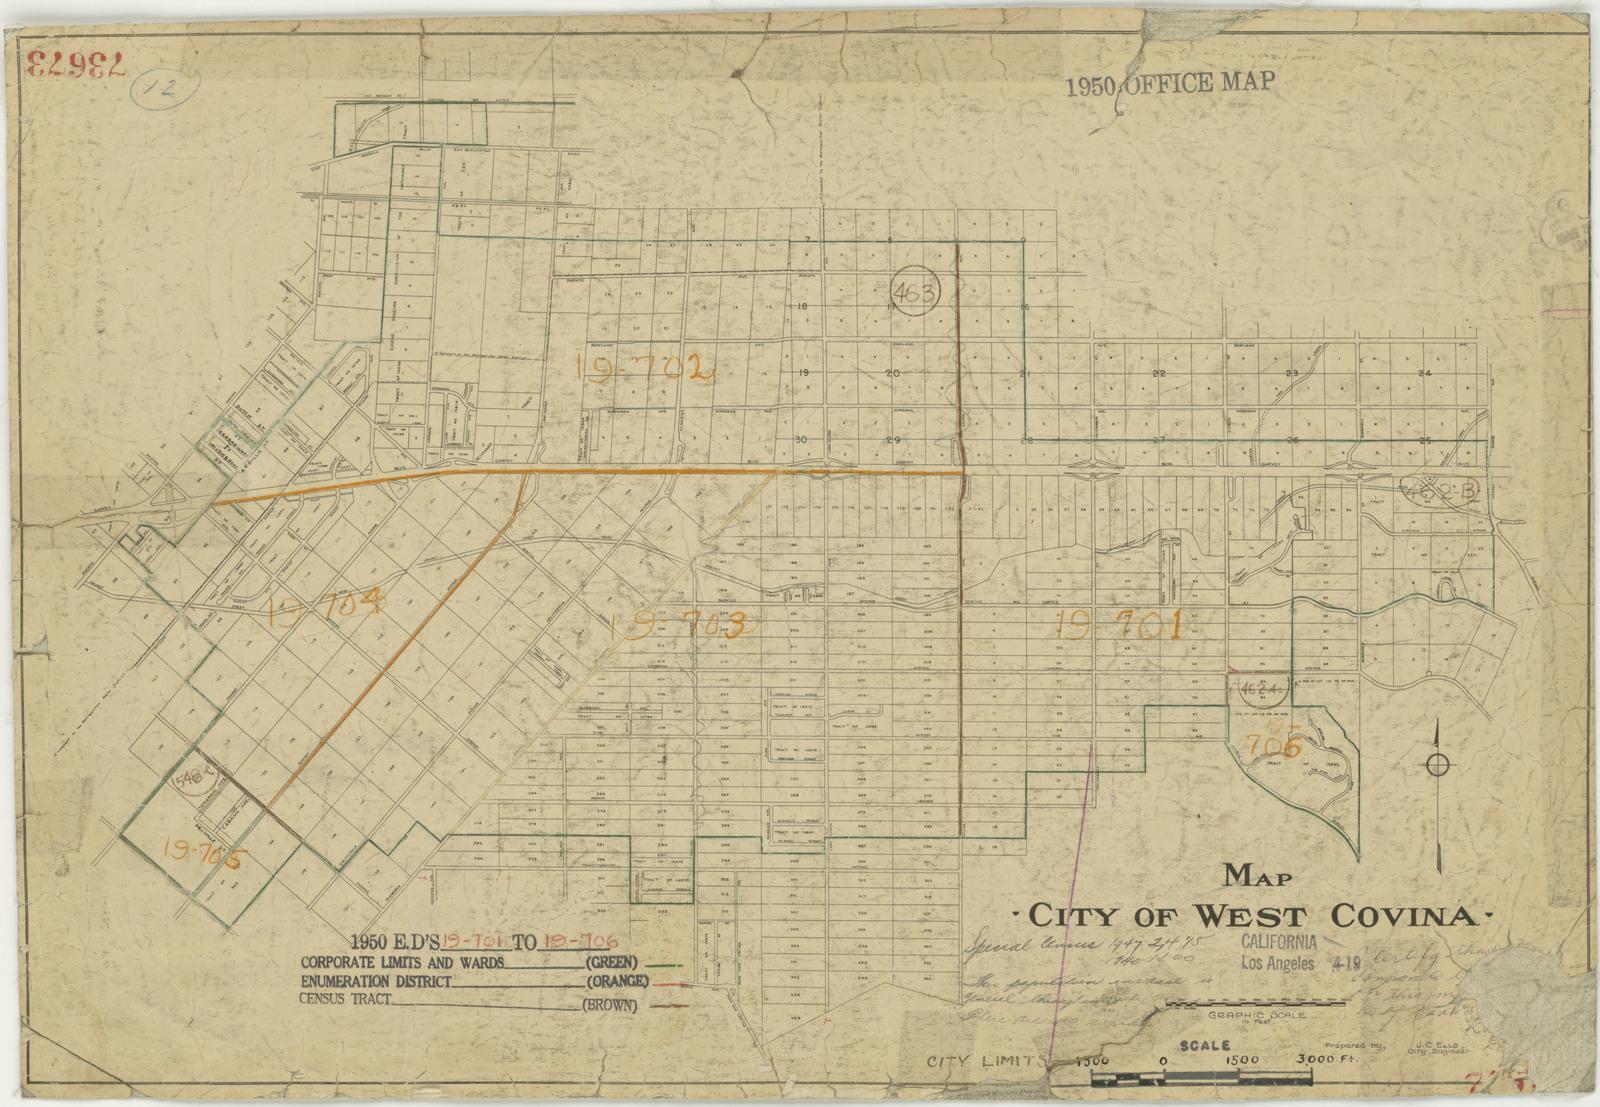 1950 Census Enumeration District Maps - California (CA) - Los